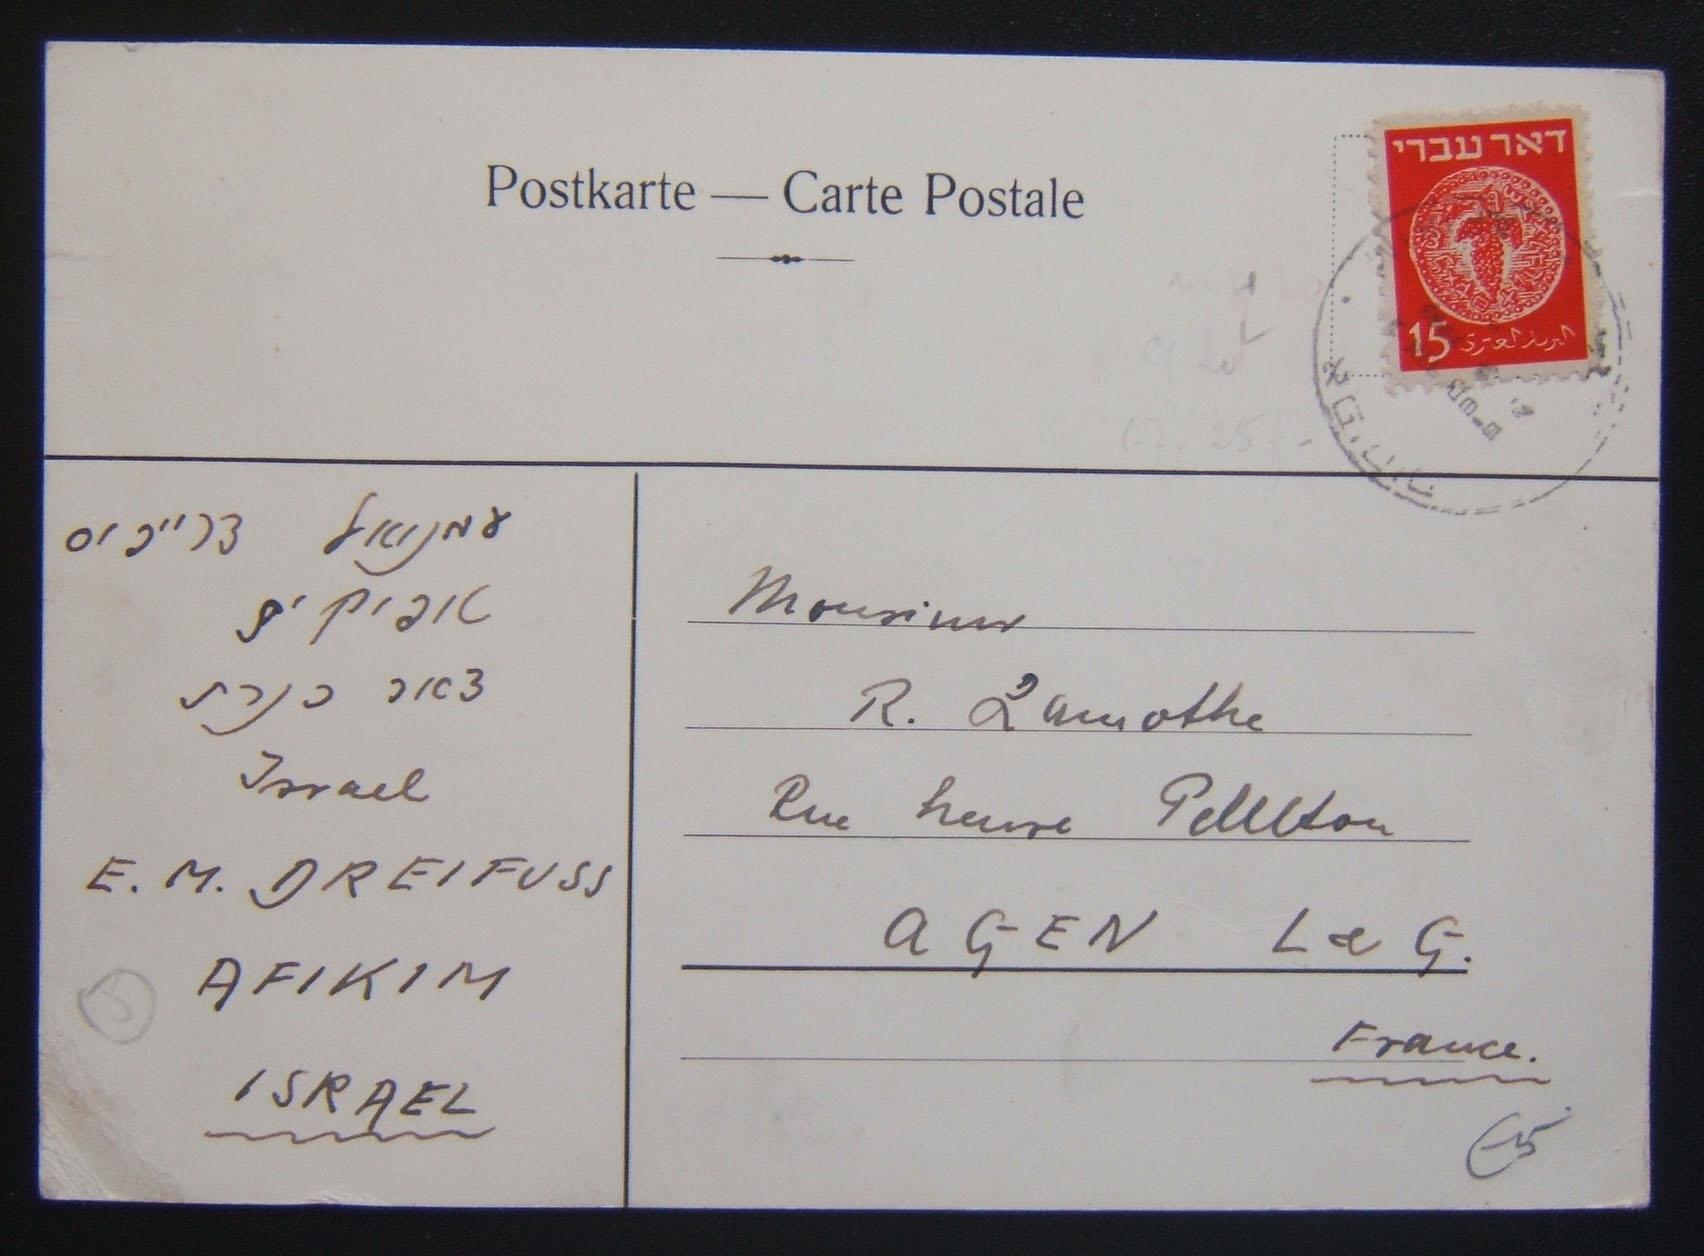 1949 2nd period surface mail: 21-3-1949 pc ex AFIKIM to FRANCE franked 15pr at SU-2 period rate using 15pr DI Ba4.